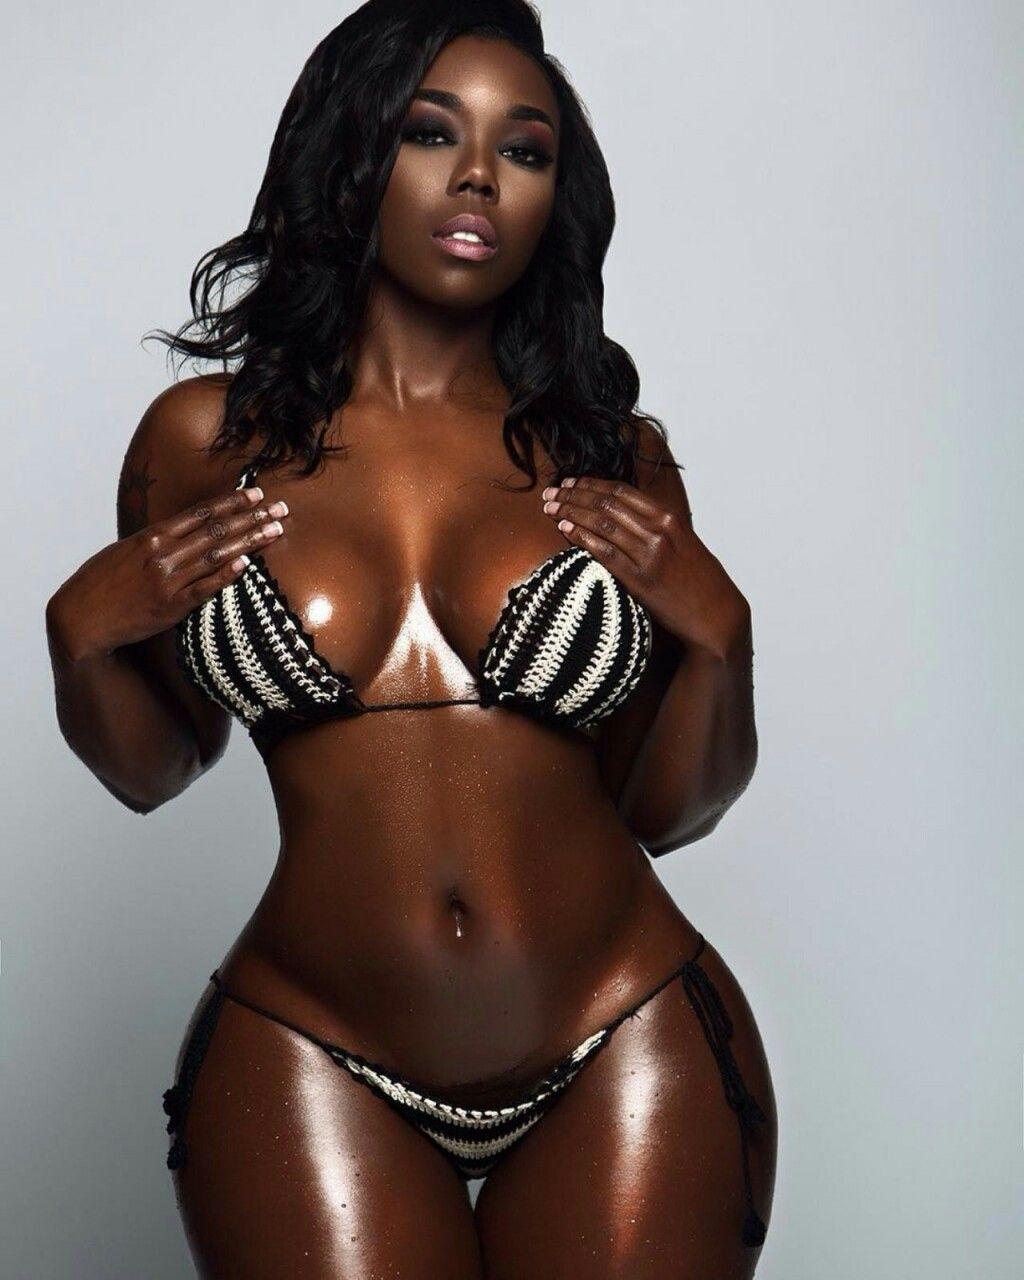 The Census Ebony in brown bikini